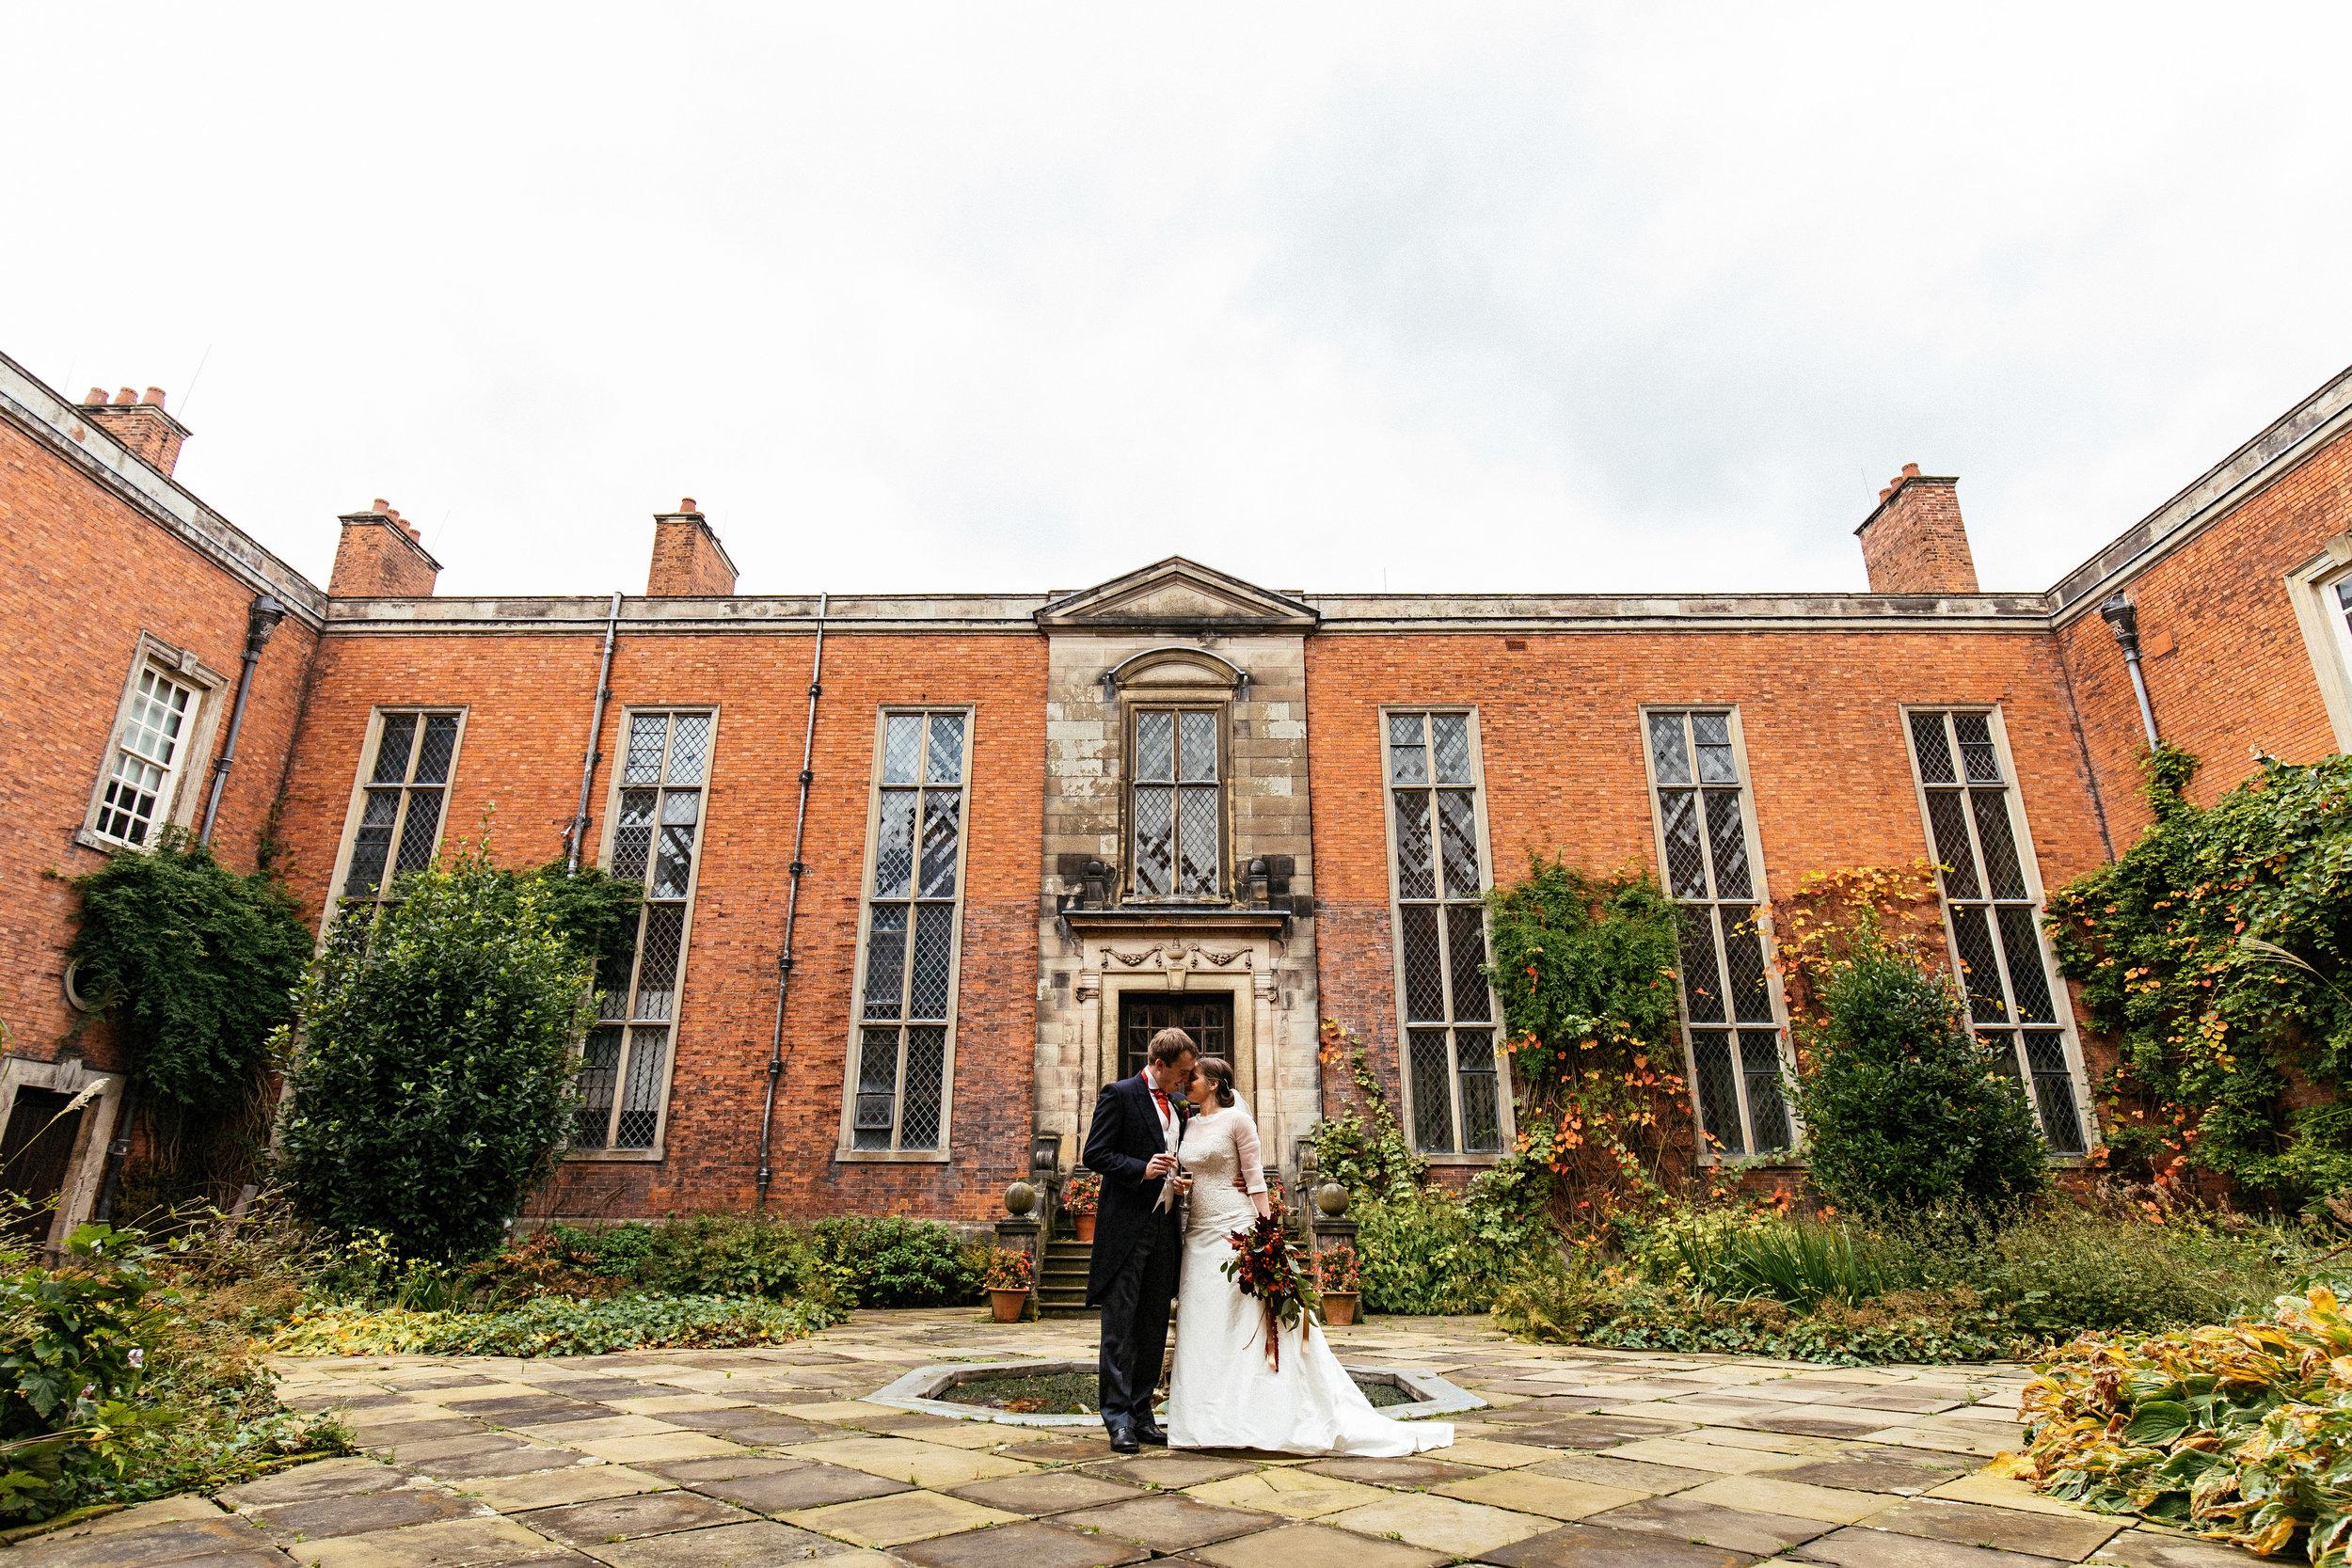 Dunham-Massey-Wedding-Photographer-39.jpg